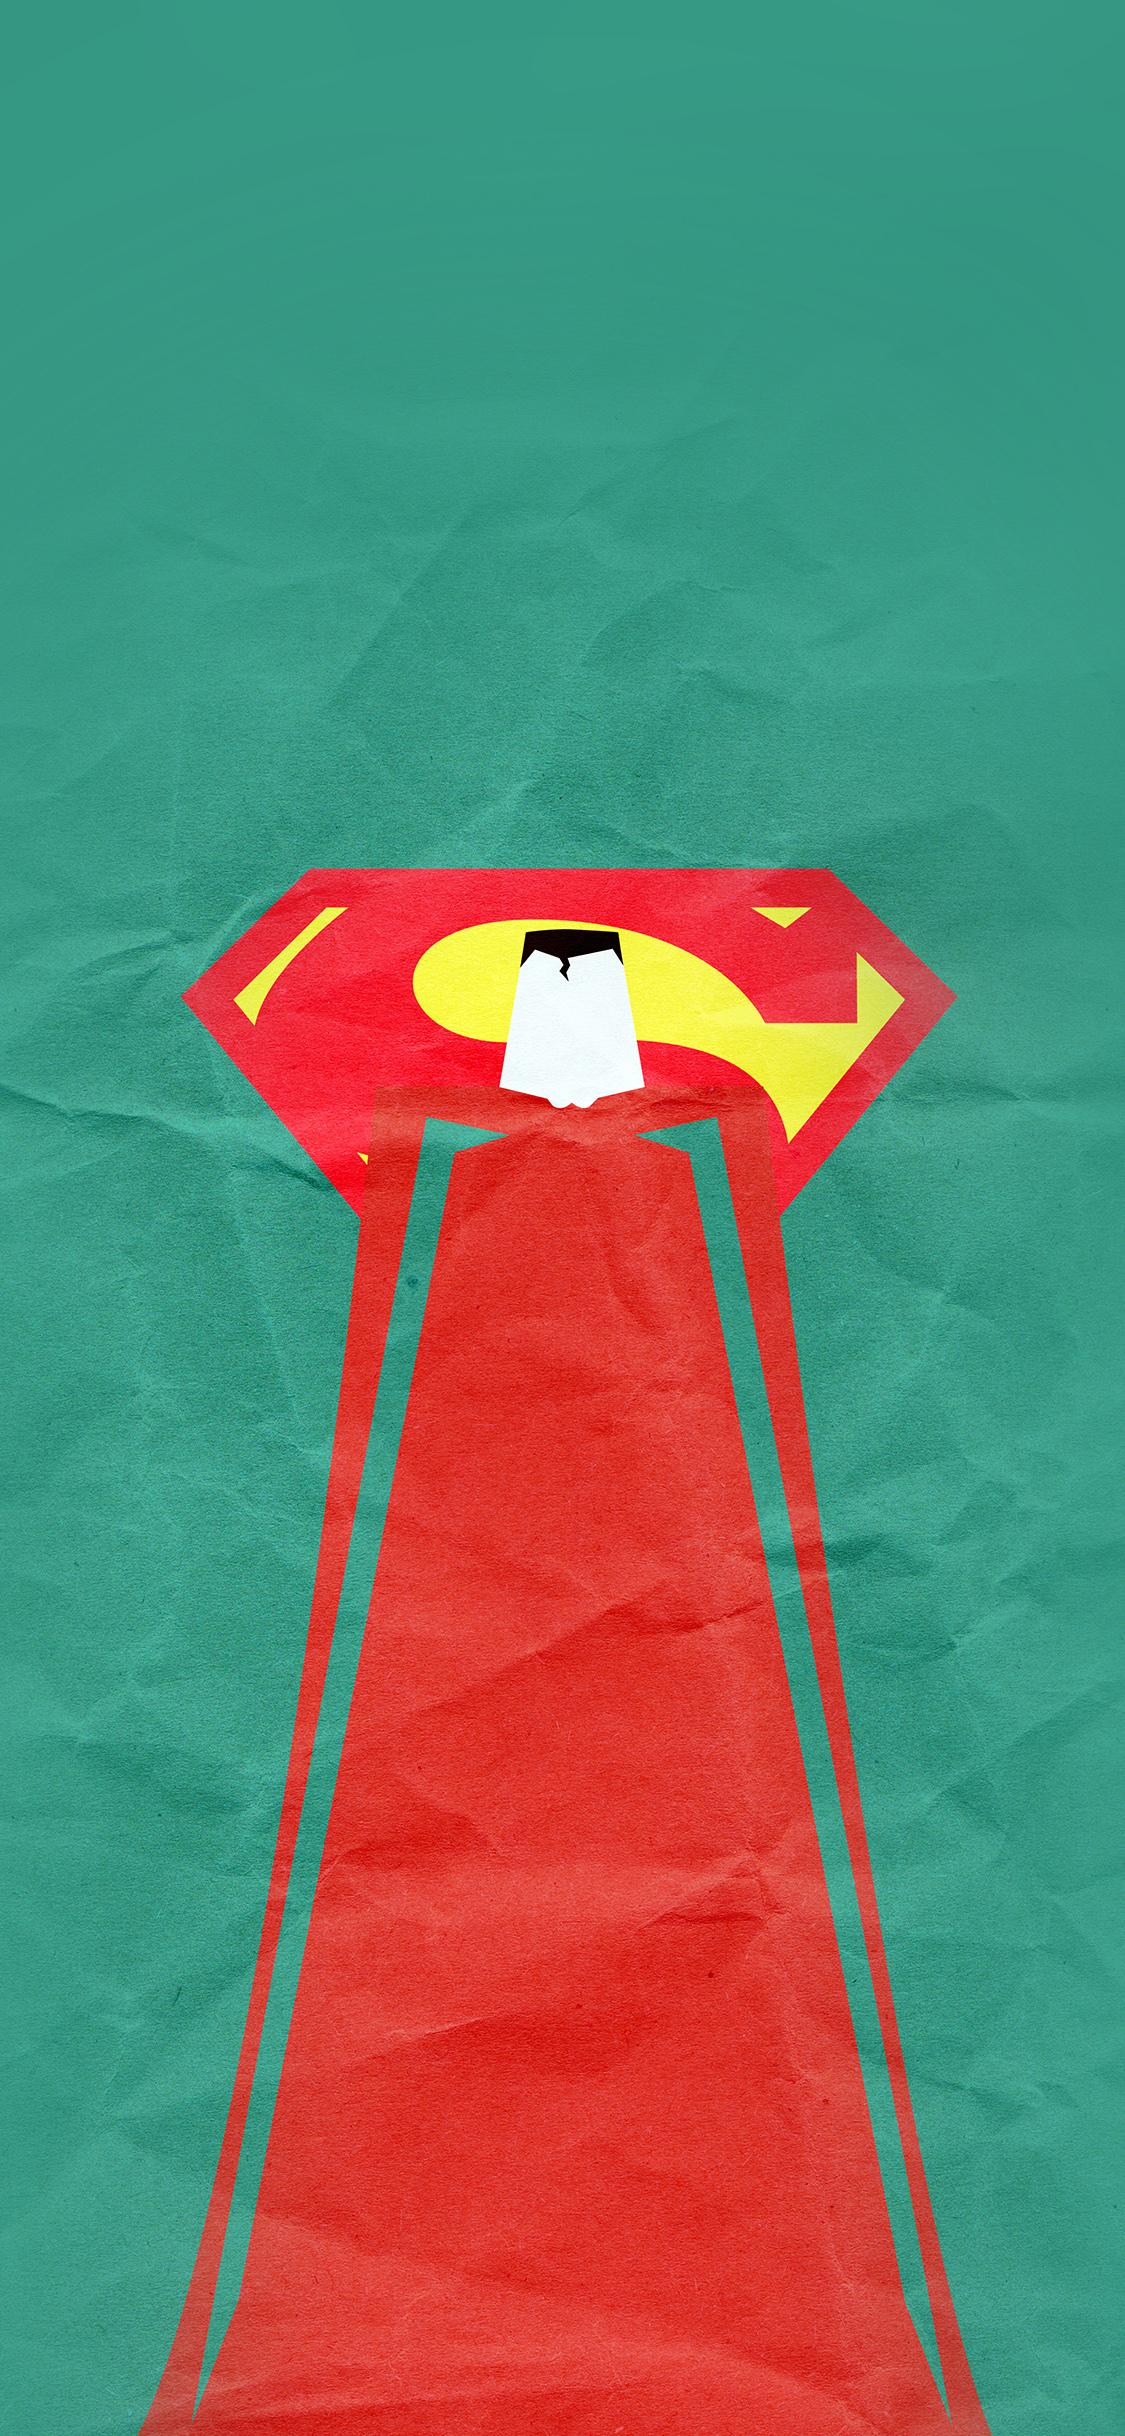 iPhoneXpapers.com-Apple-iPhone-wallpaper-au68-superman-minimal-art-illustration-art-green